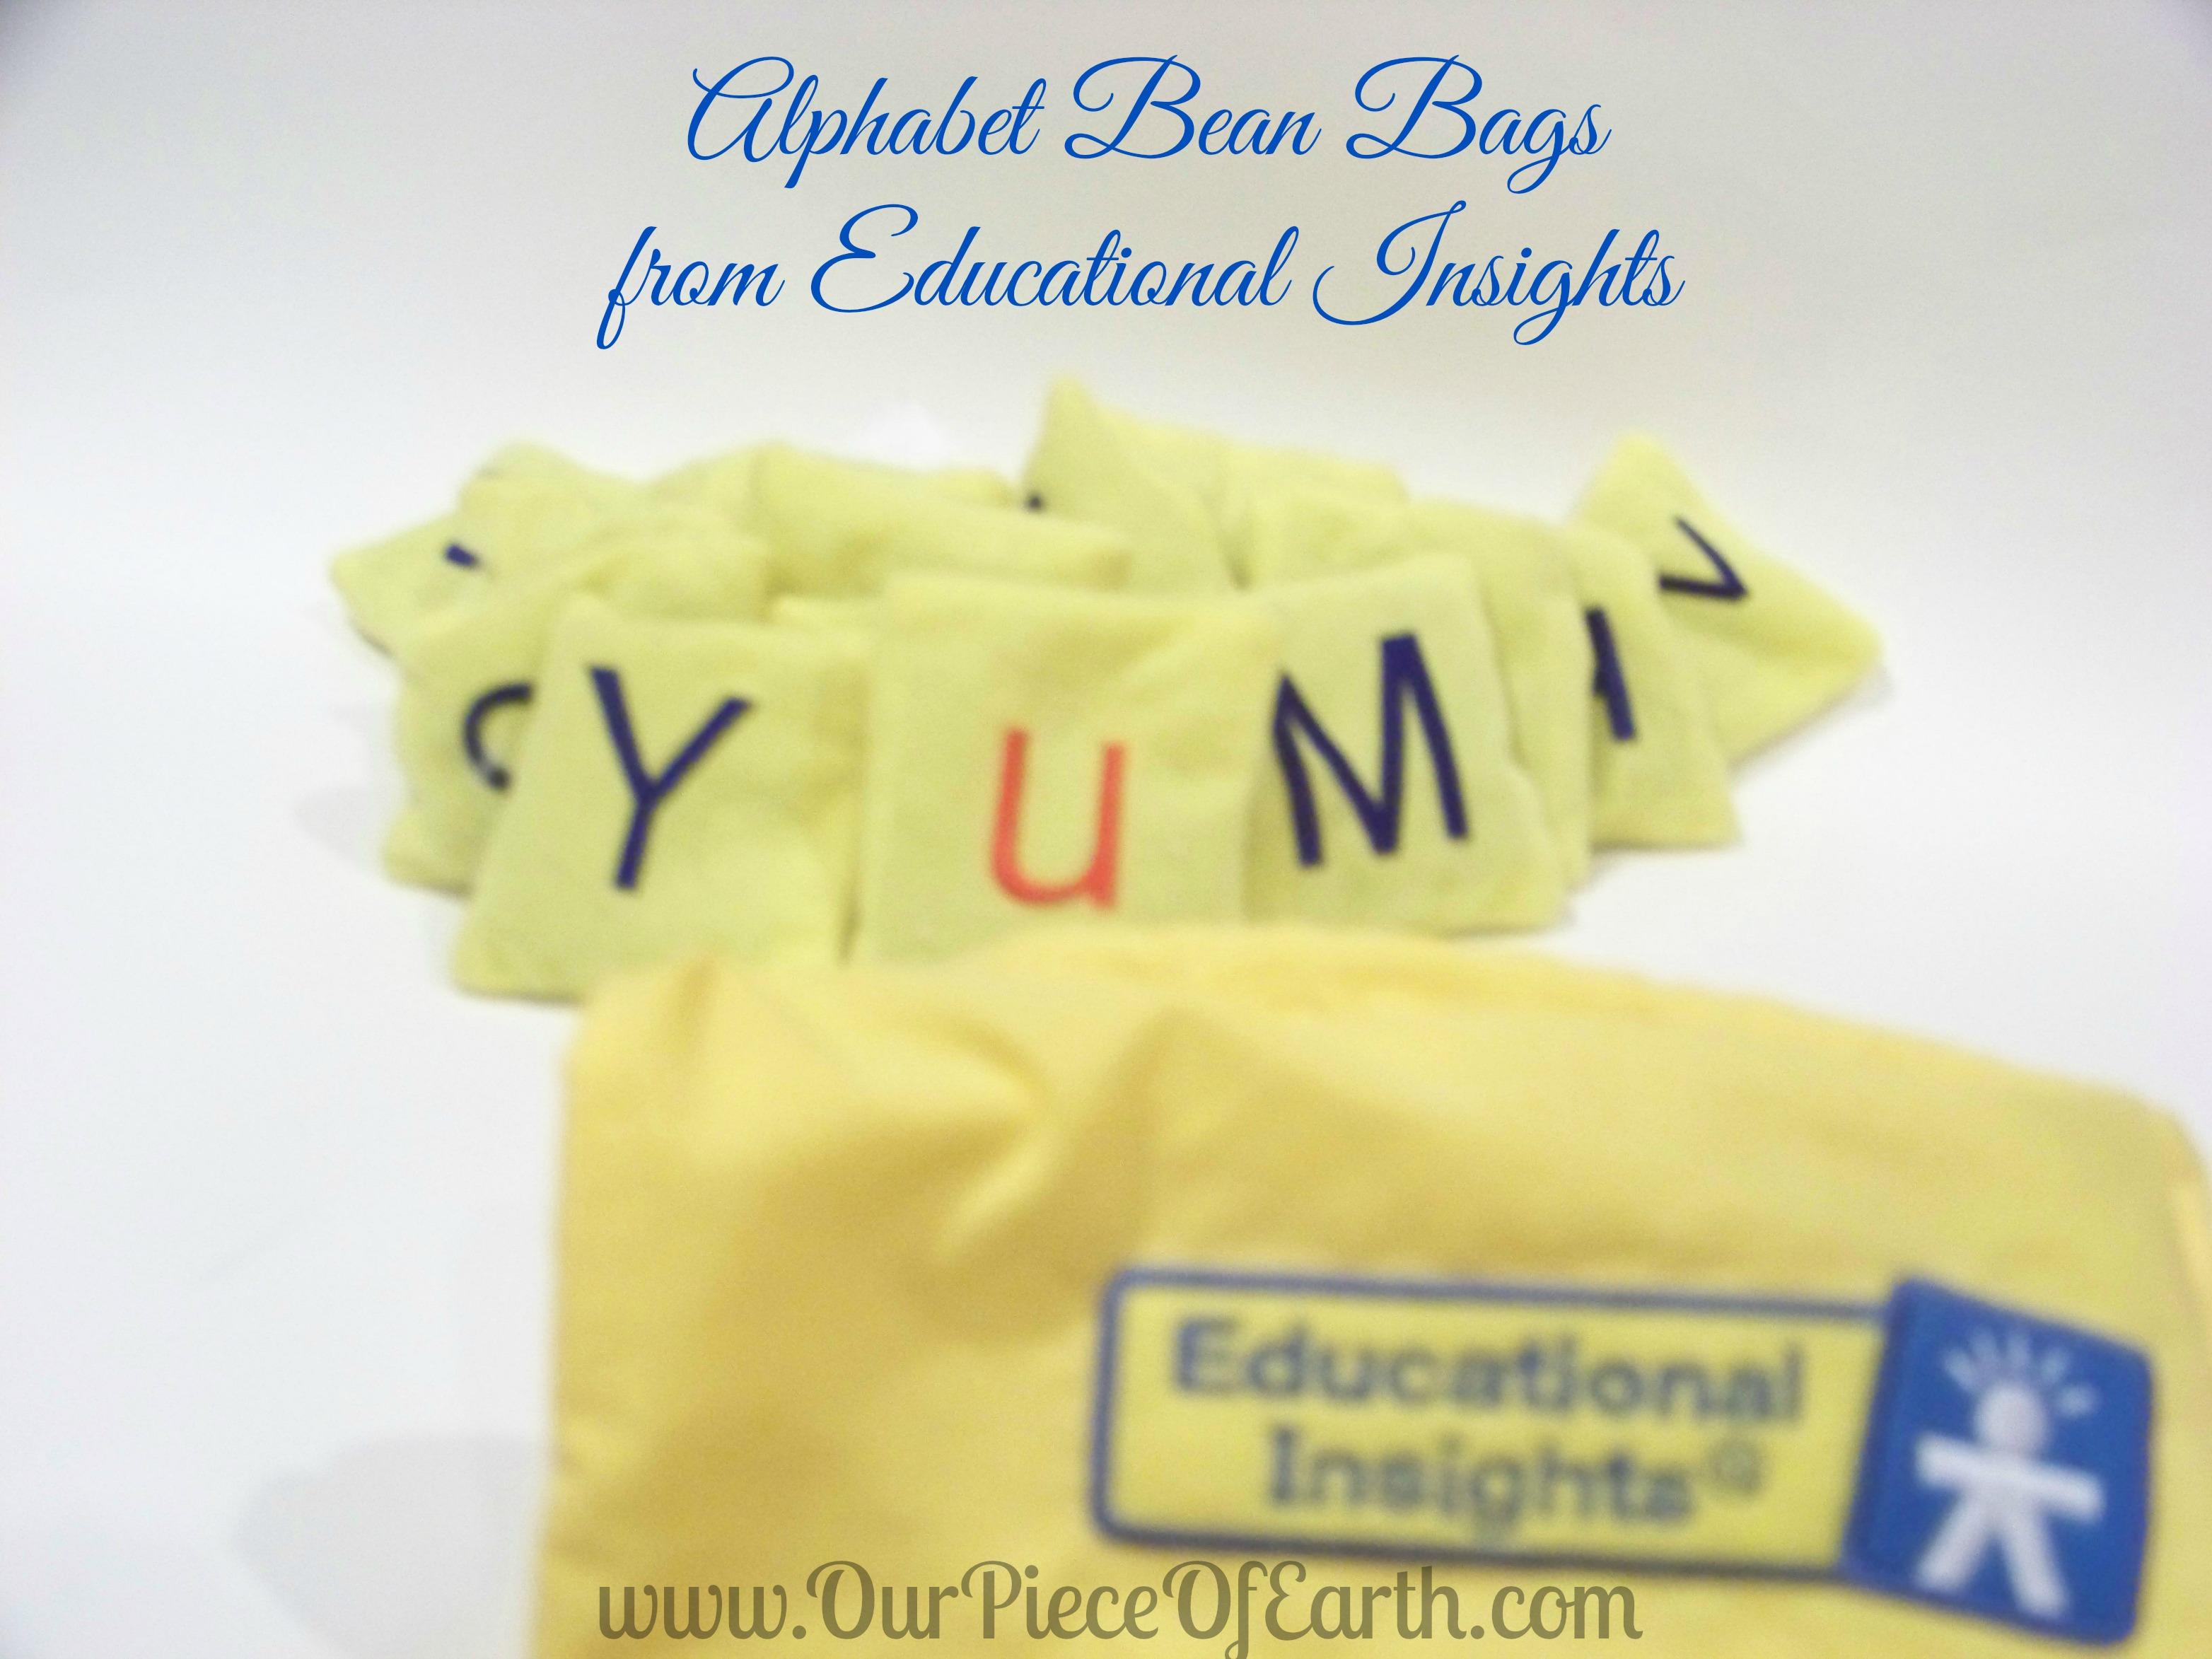 Alphabet bean bags, Educational Insights